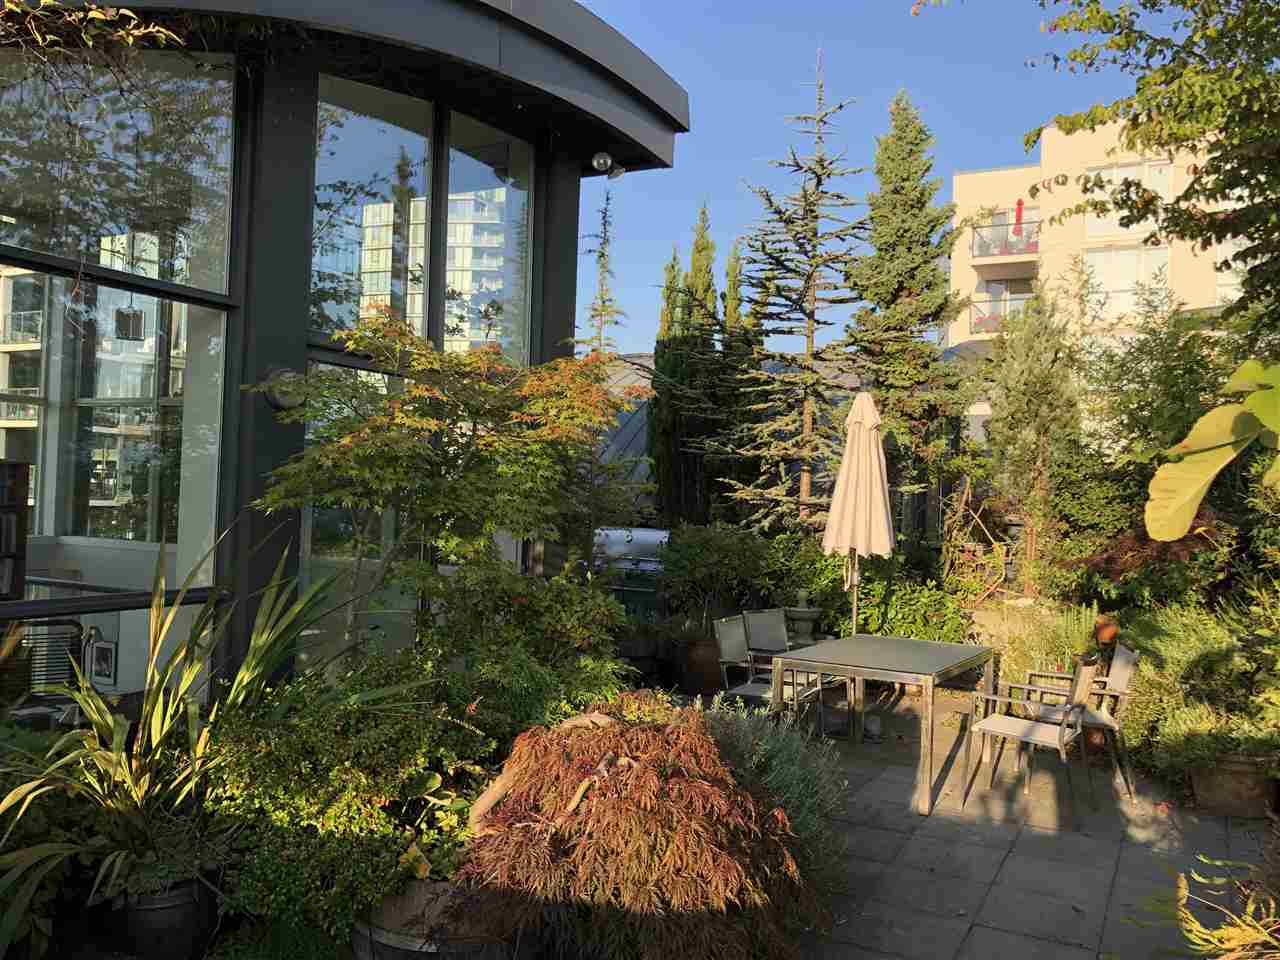 607 1425 W 6TH AVENUE - False Creek Apartment/Condo for sale, 2 Bedrooms (R2447494) - #17